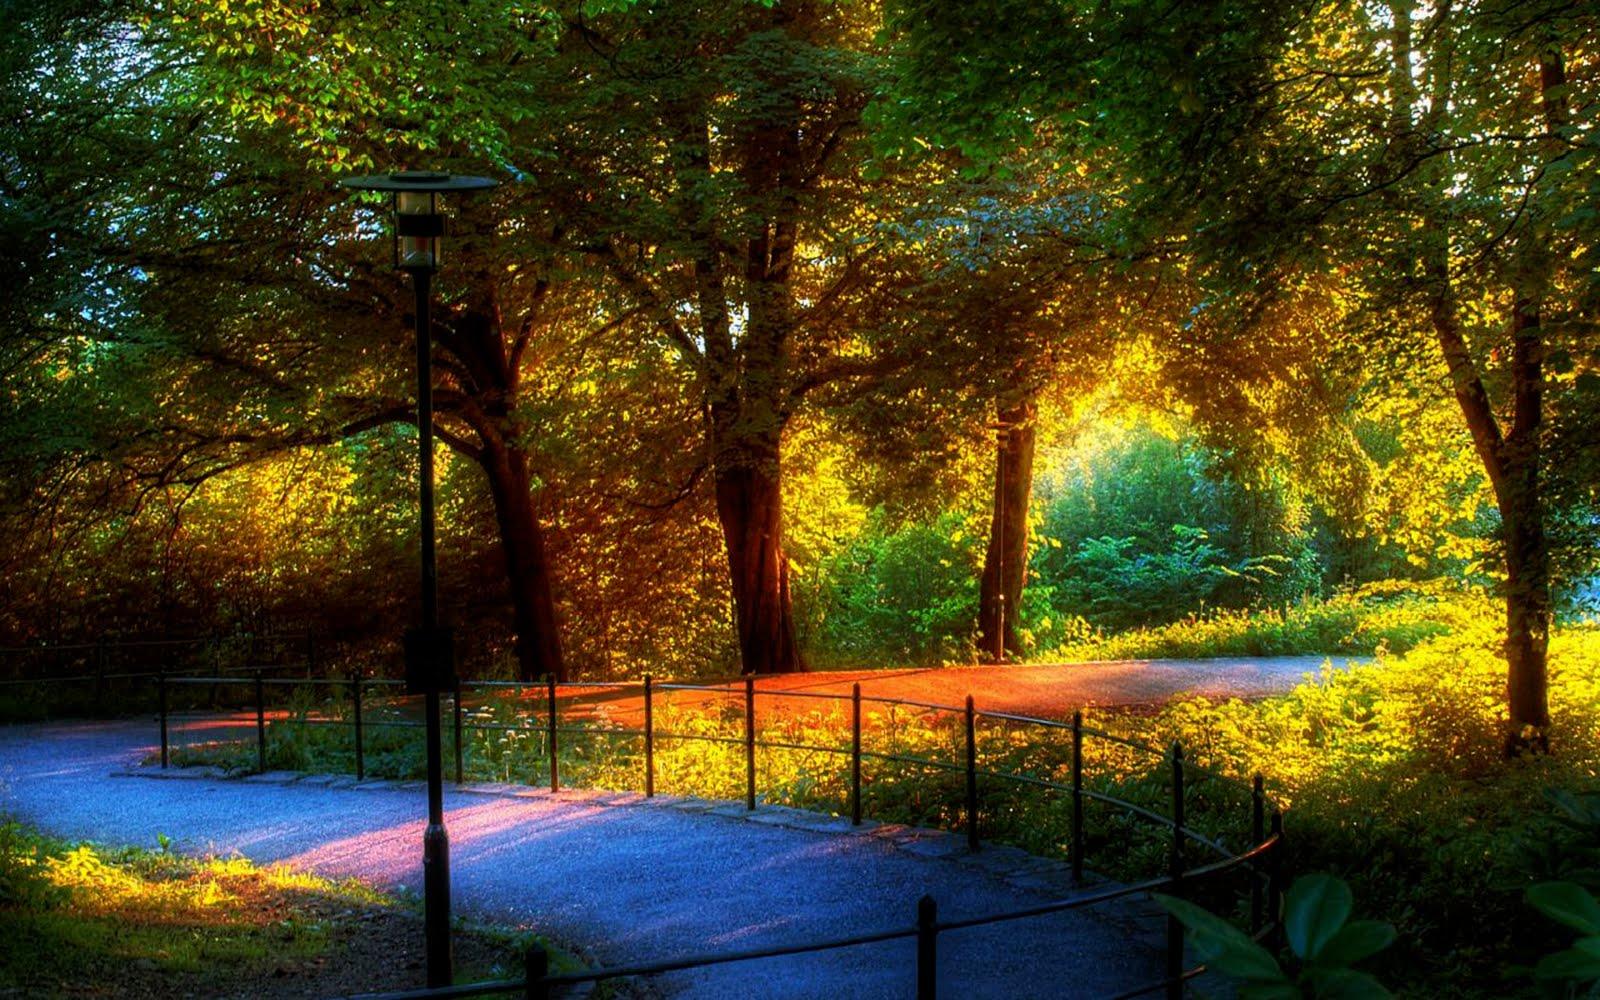 Beautiful Nature Images World - HD Wallpaper